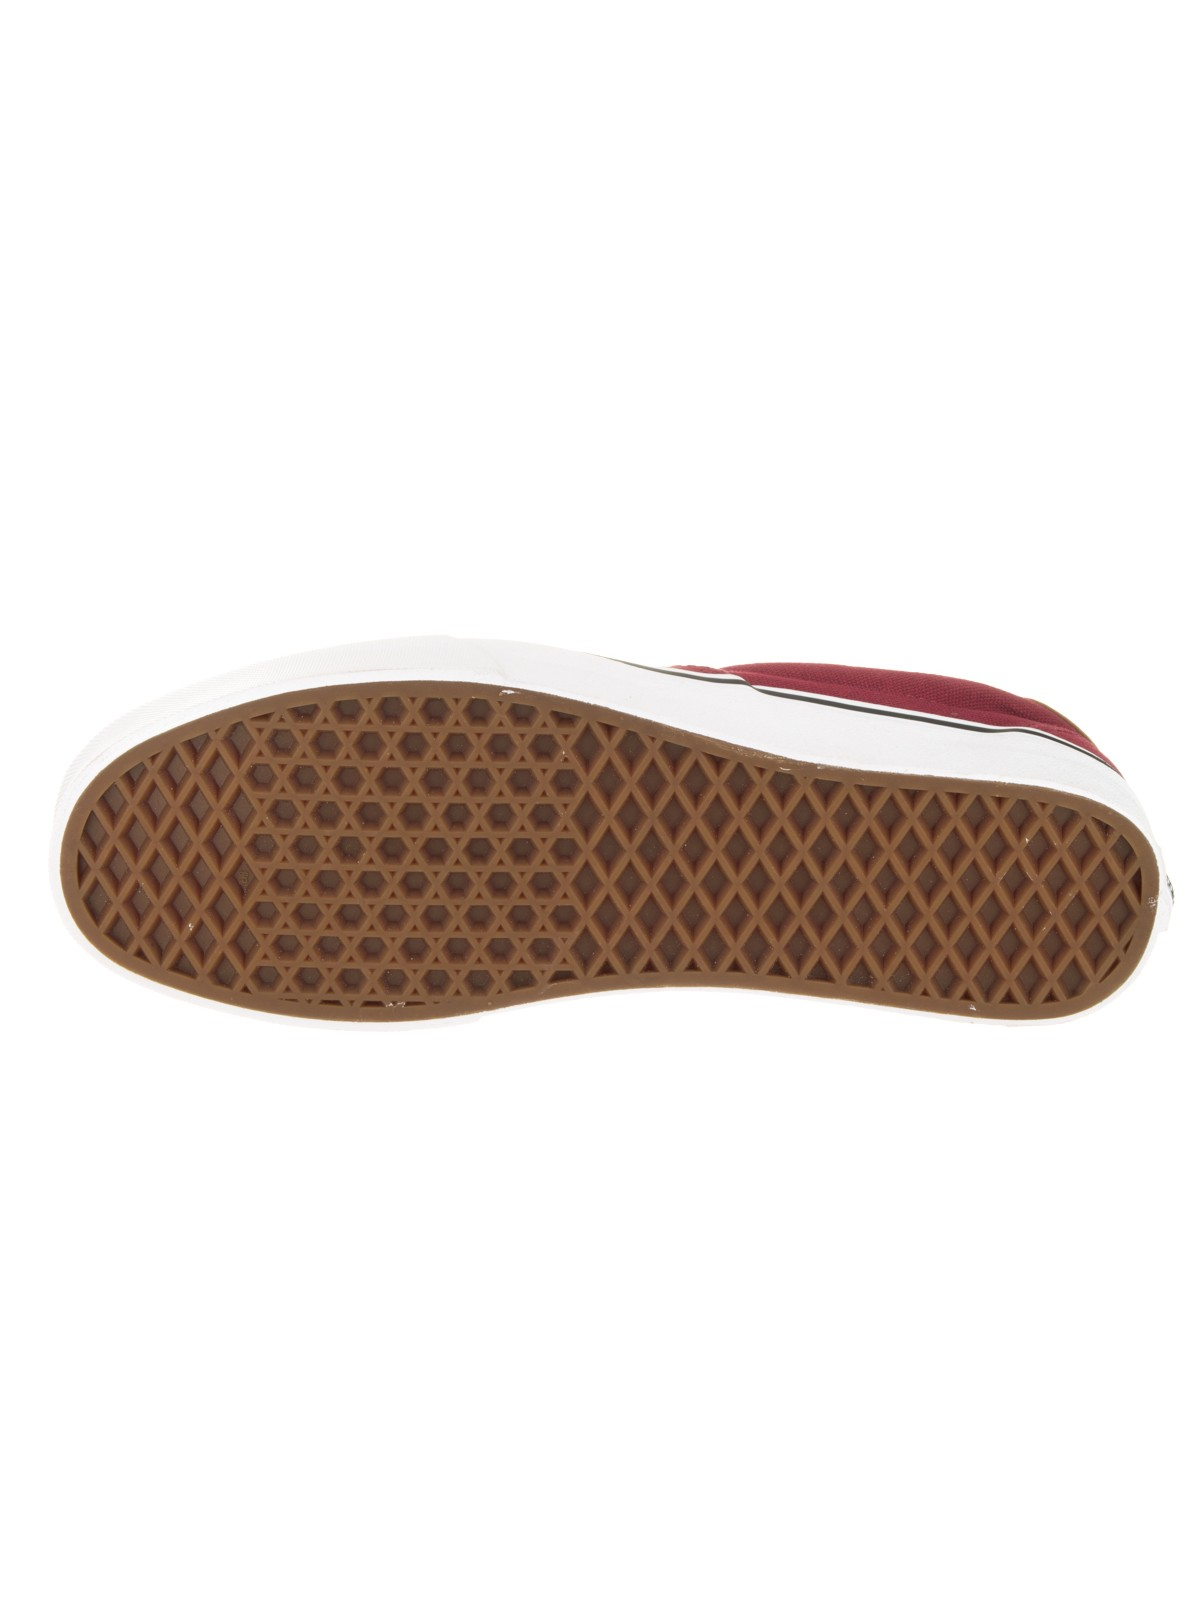 Vans Unisex Era 59 (C&L) Skate Shoe